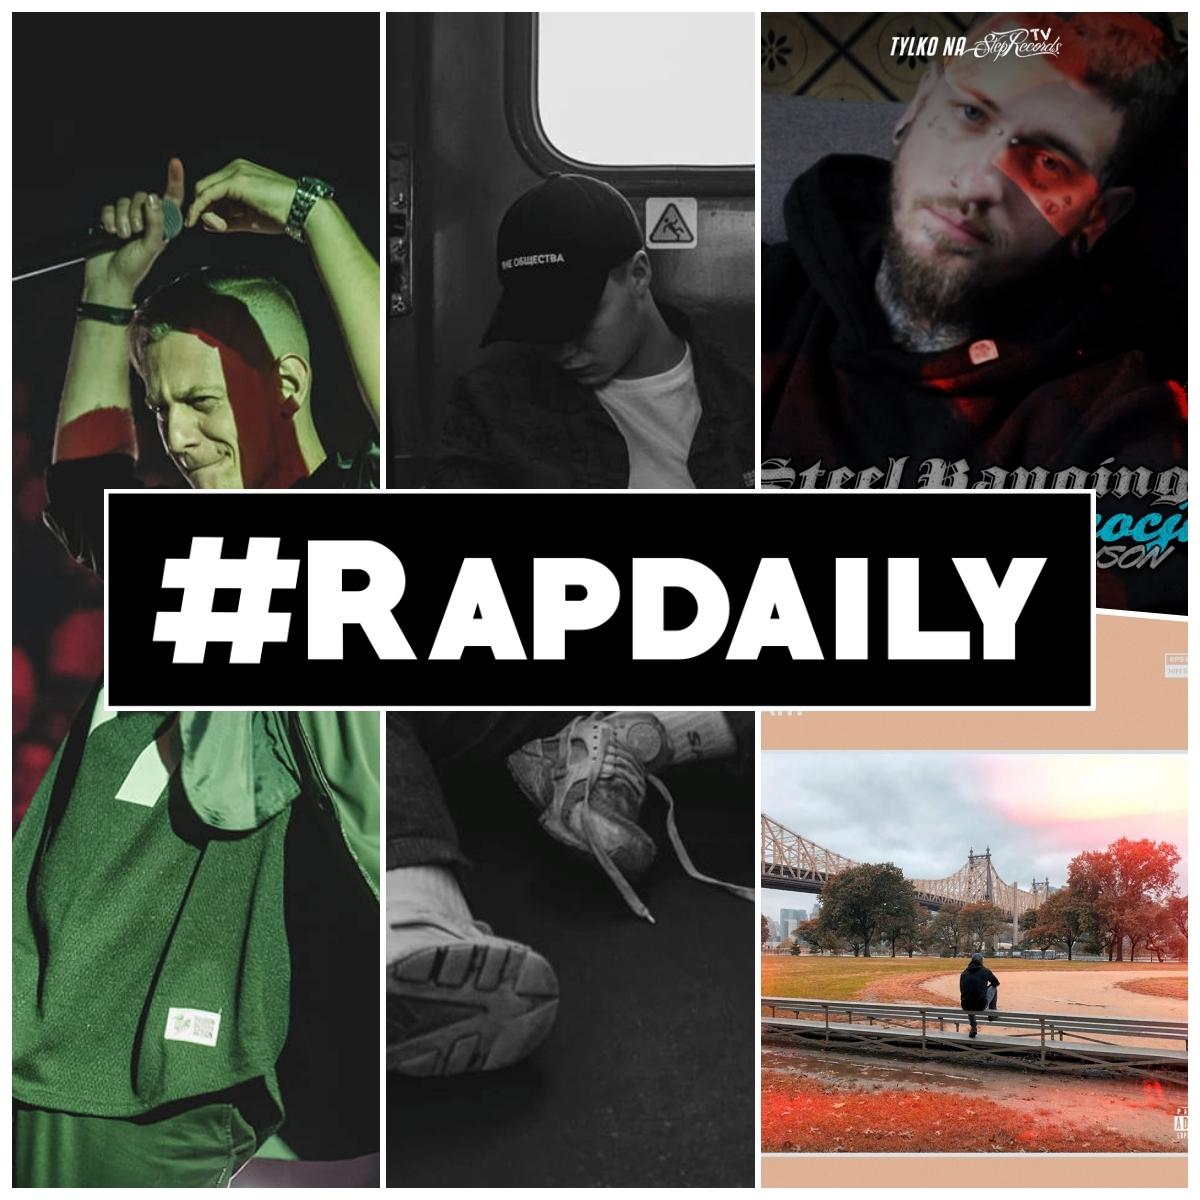 Przyłu & VBS | Te-Tris | Peja |Steel Banging || #RapDaily